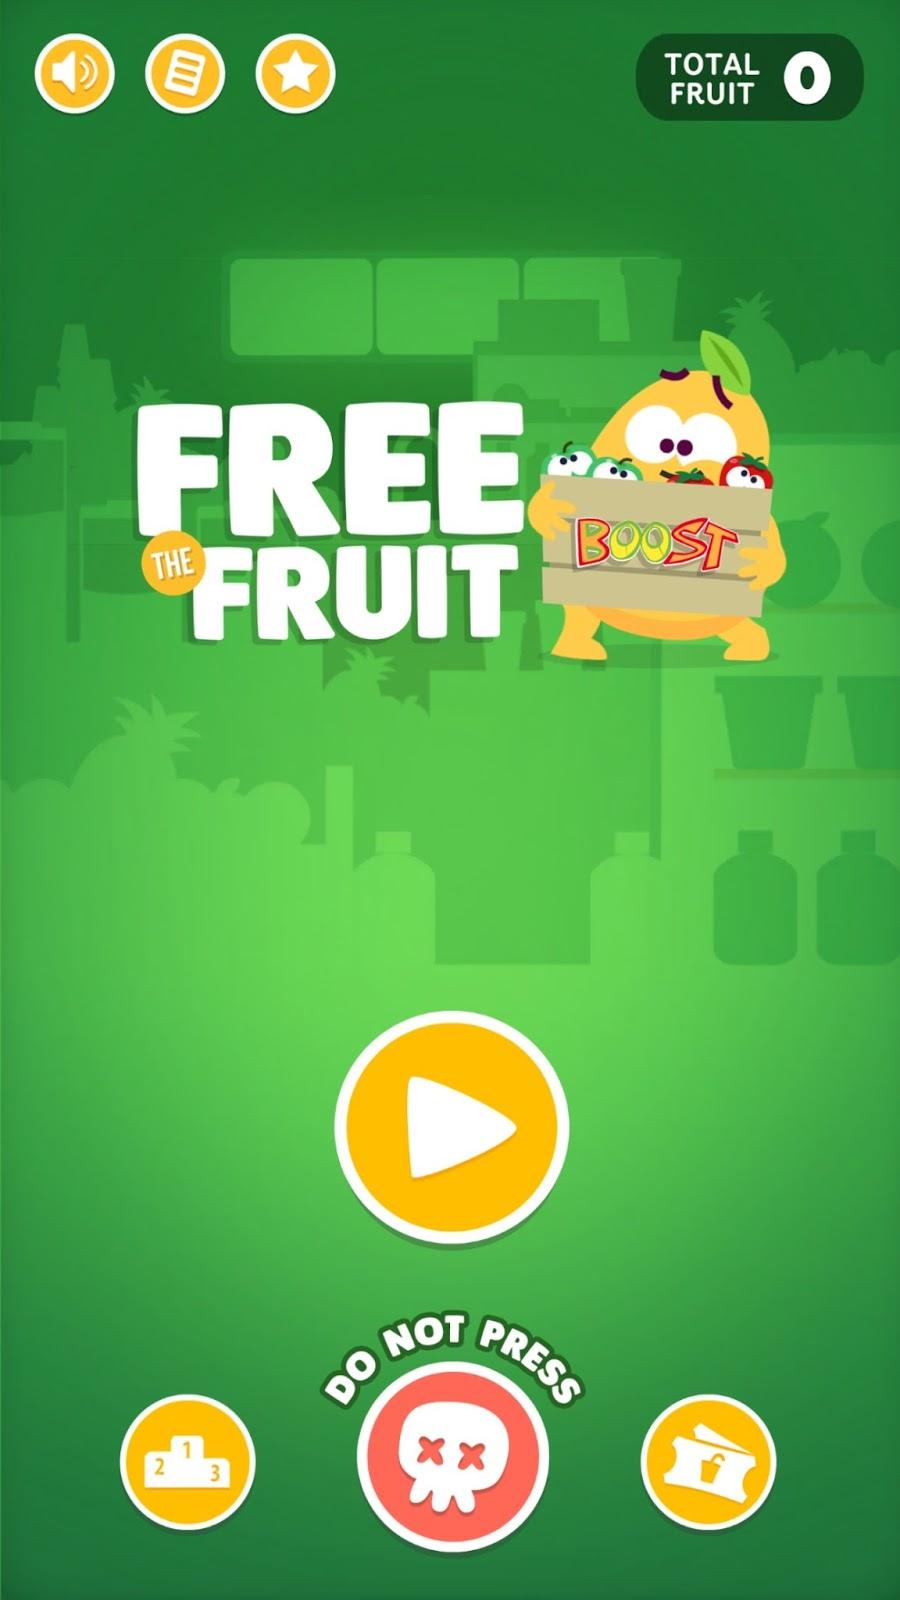 freethefruit app